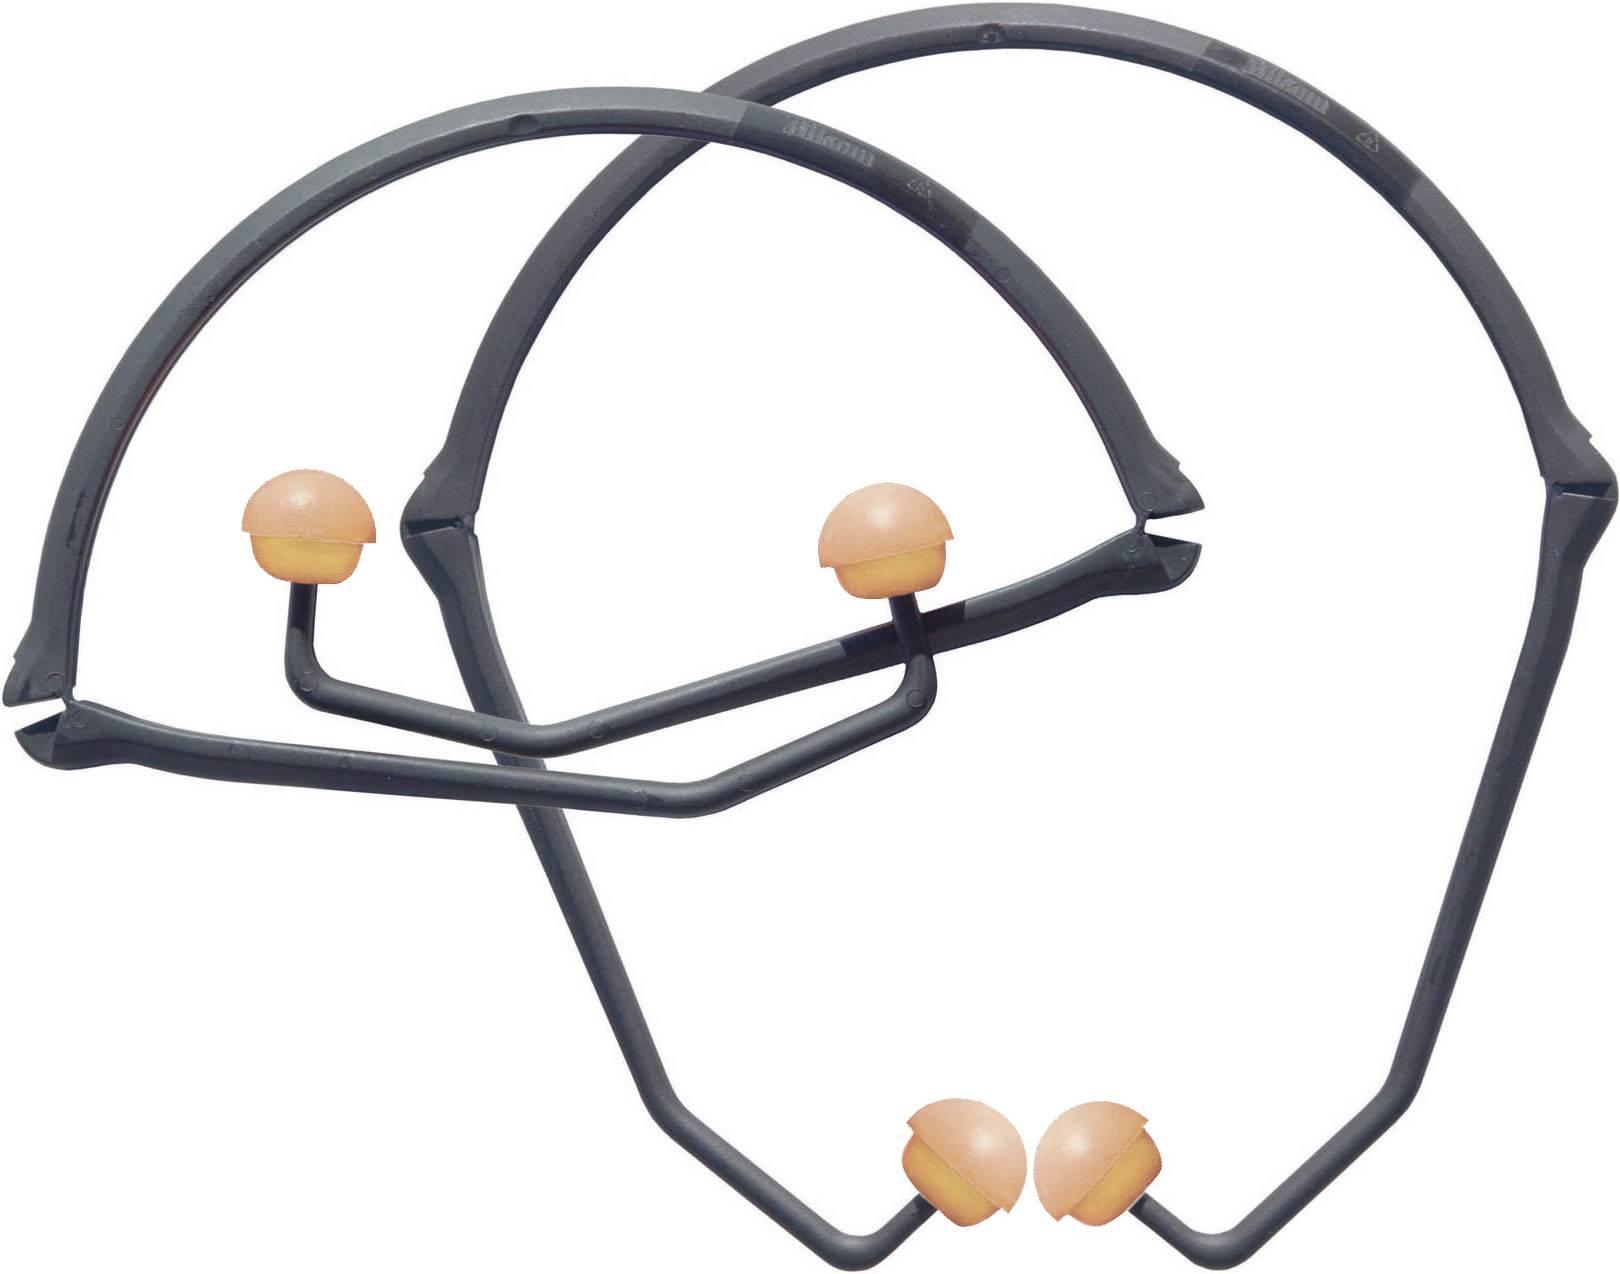 Špunty do uší na plastovém oblouku Bilsom PERCAP 1005952, 24 dB, 1 ks